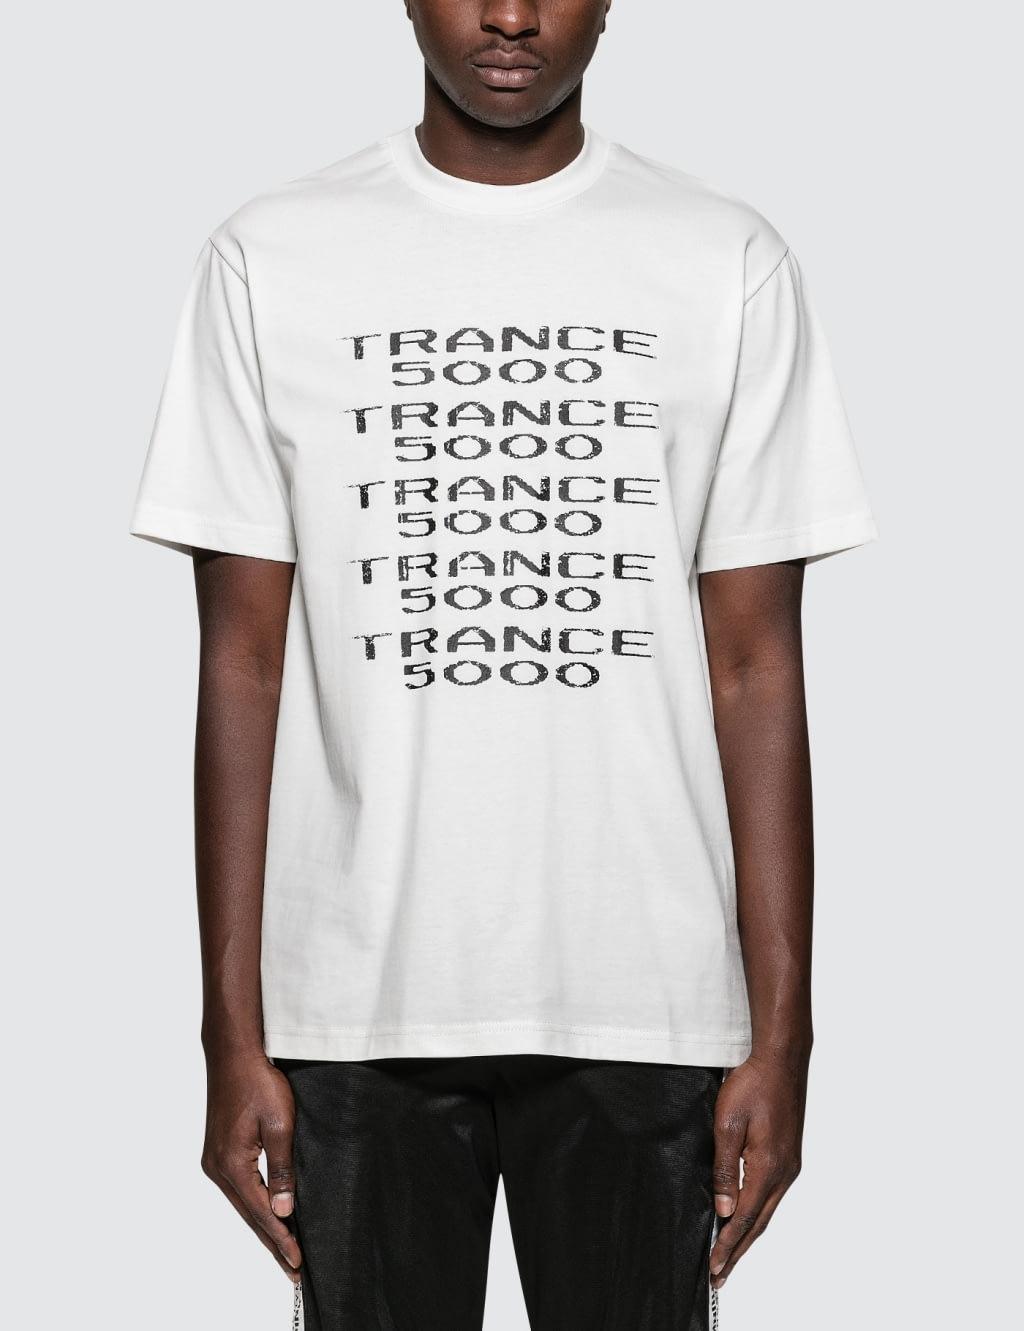 MISBHV Trance 5000 T-Shirt ...